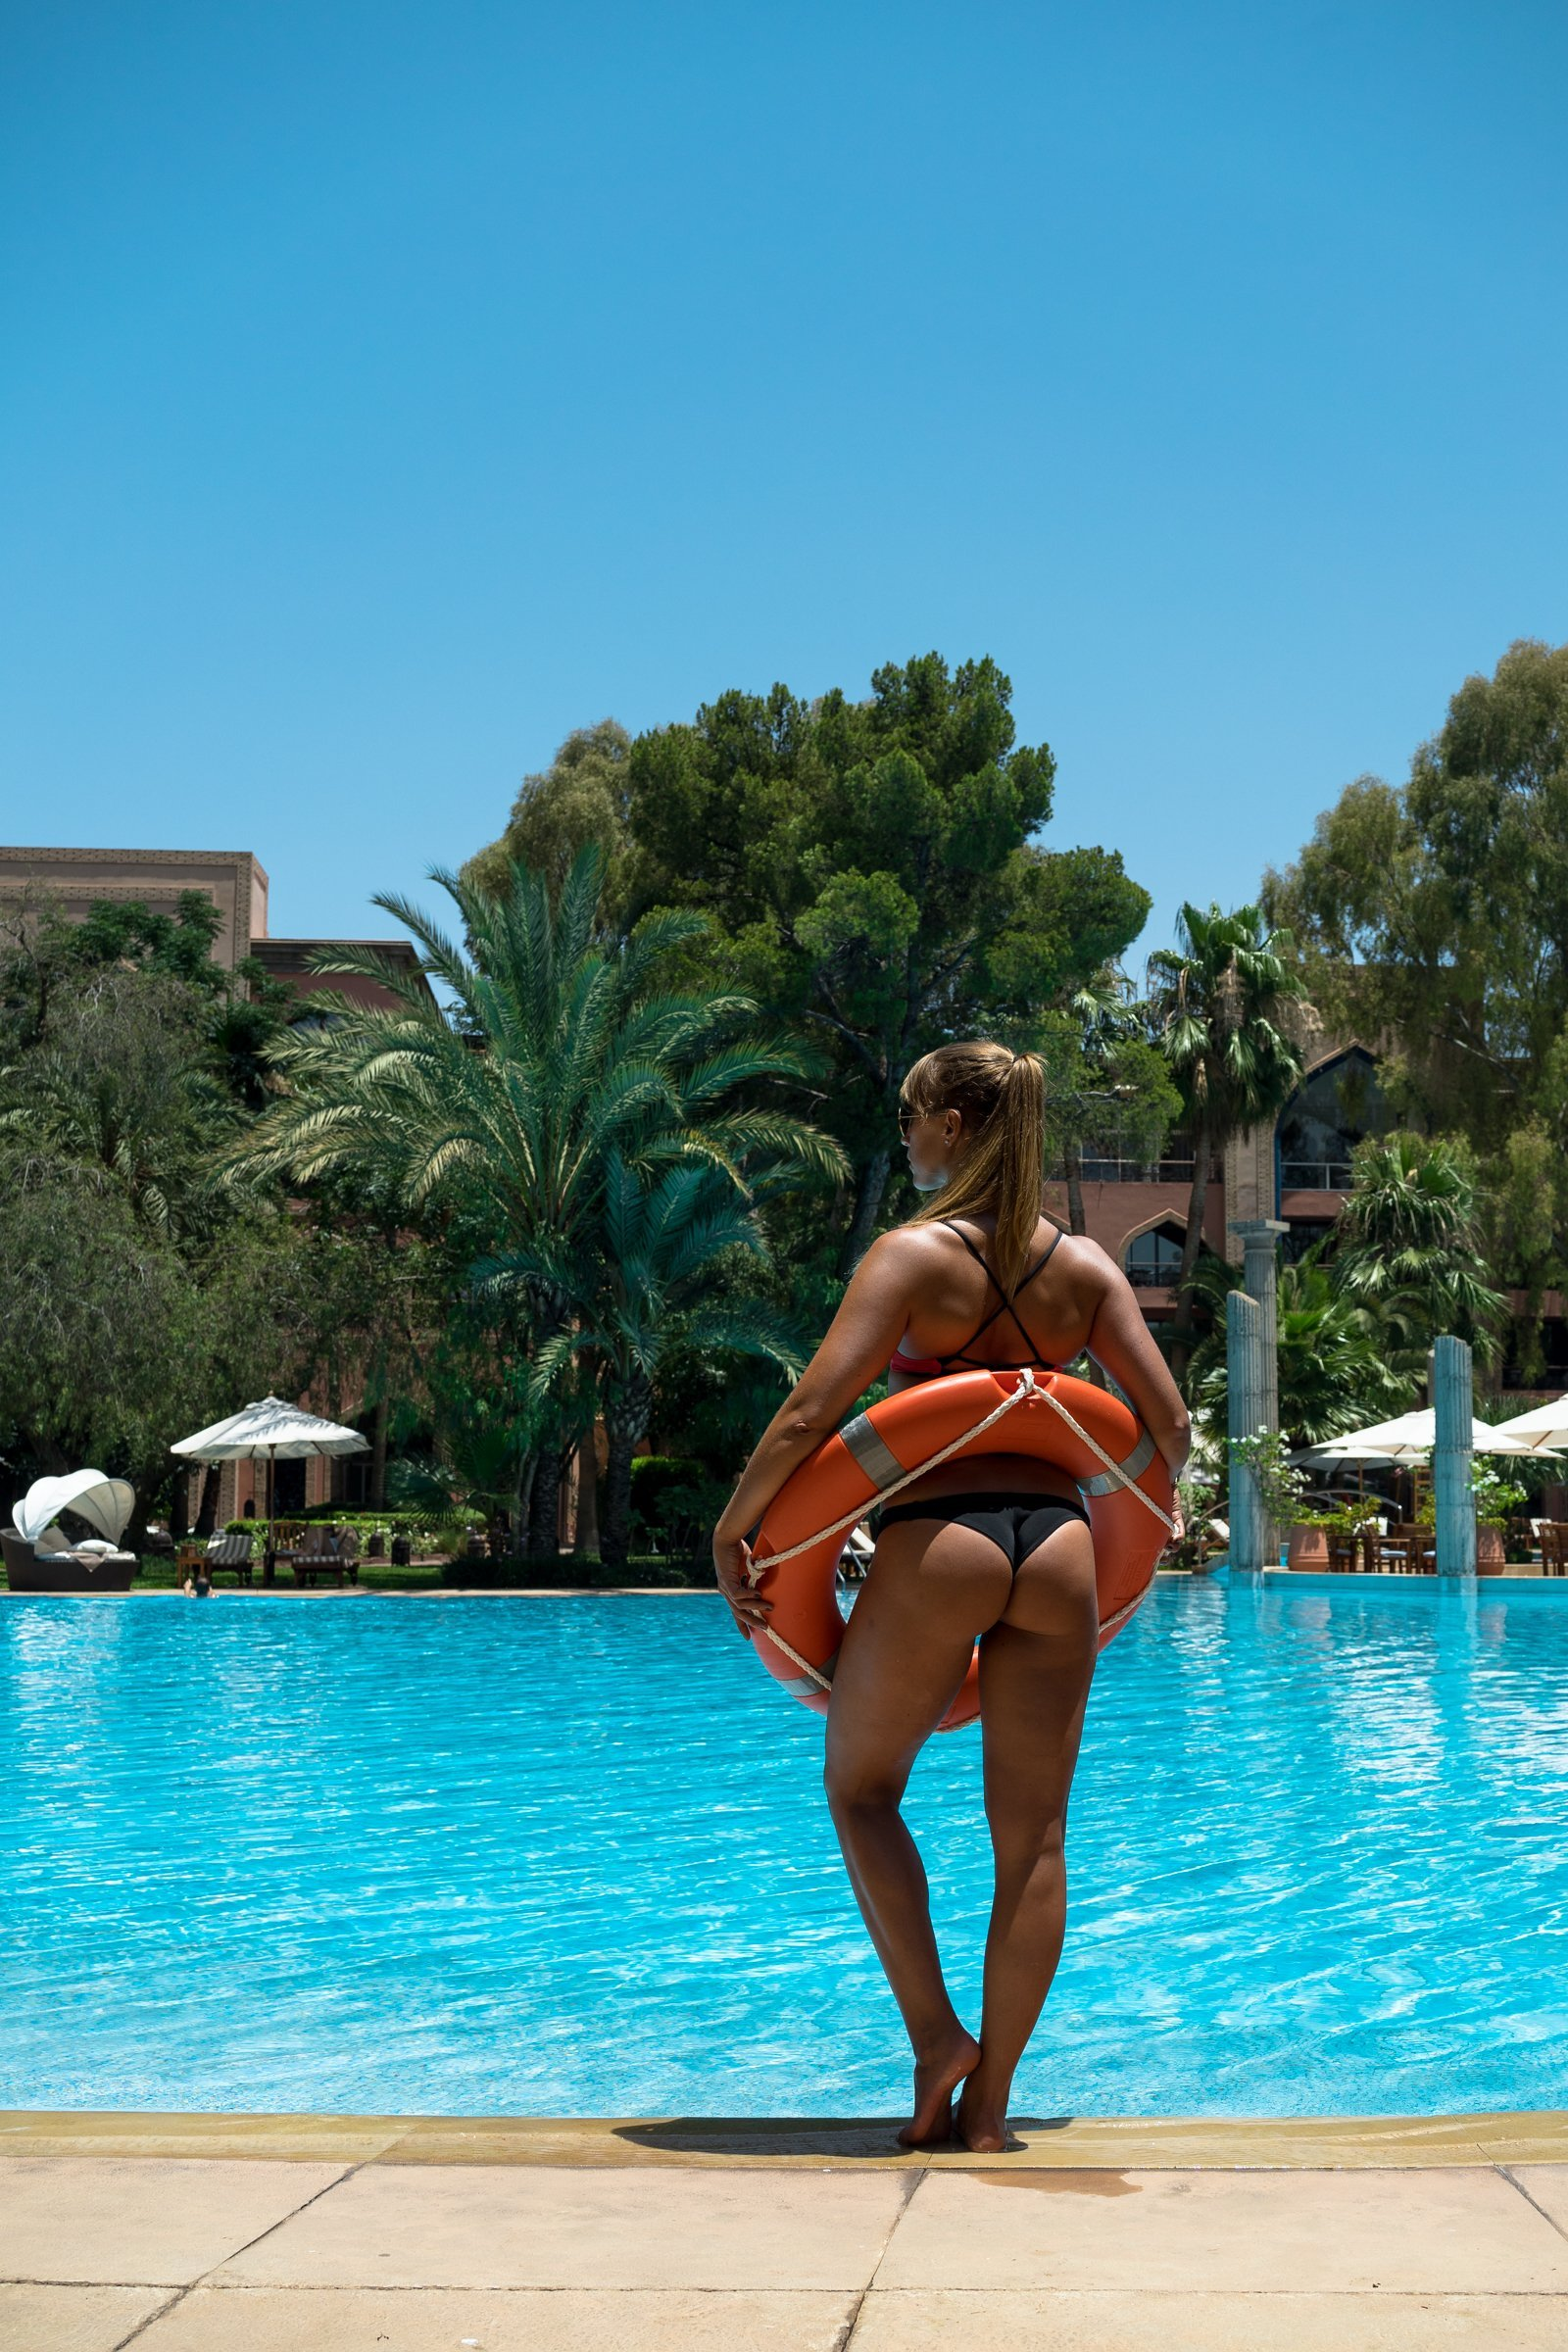 Es Saadi Palace Garden Resorts Diana Rettungsring Hintern Bubblebutt Pool